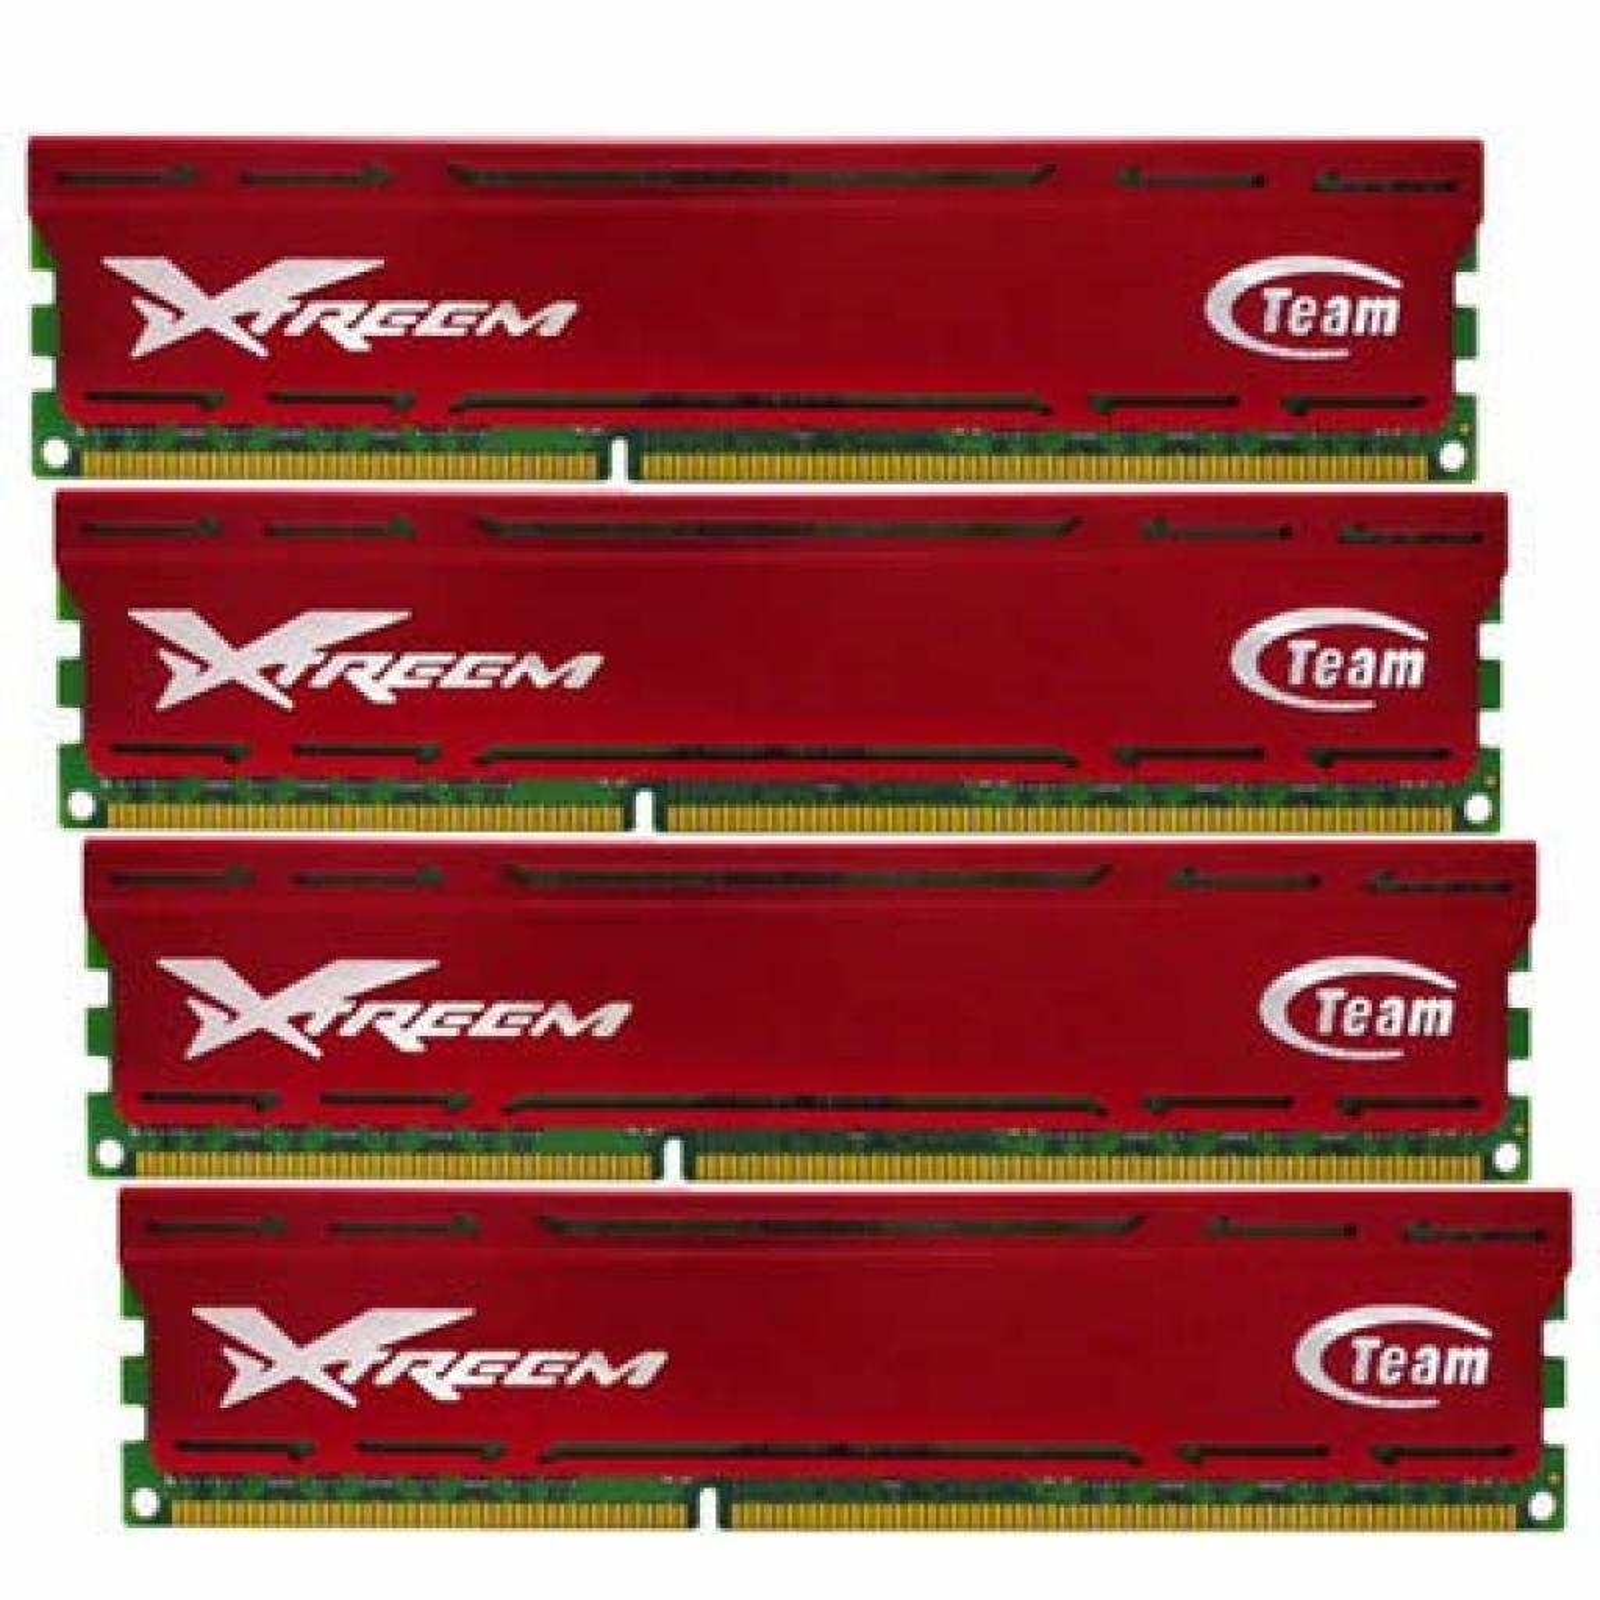 Модуль памяти для компьютера DDR3 16GB (4x4GB) 1600 MHz Team (TLD316G1600HC9QC01)